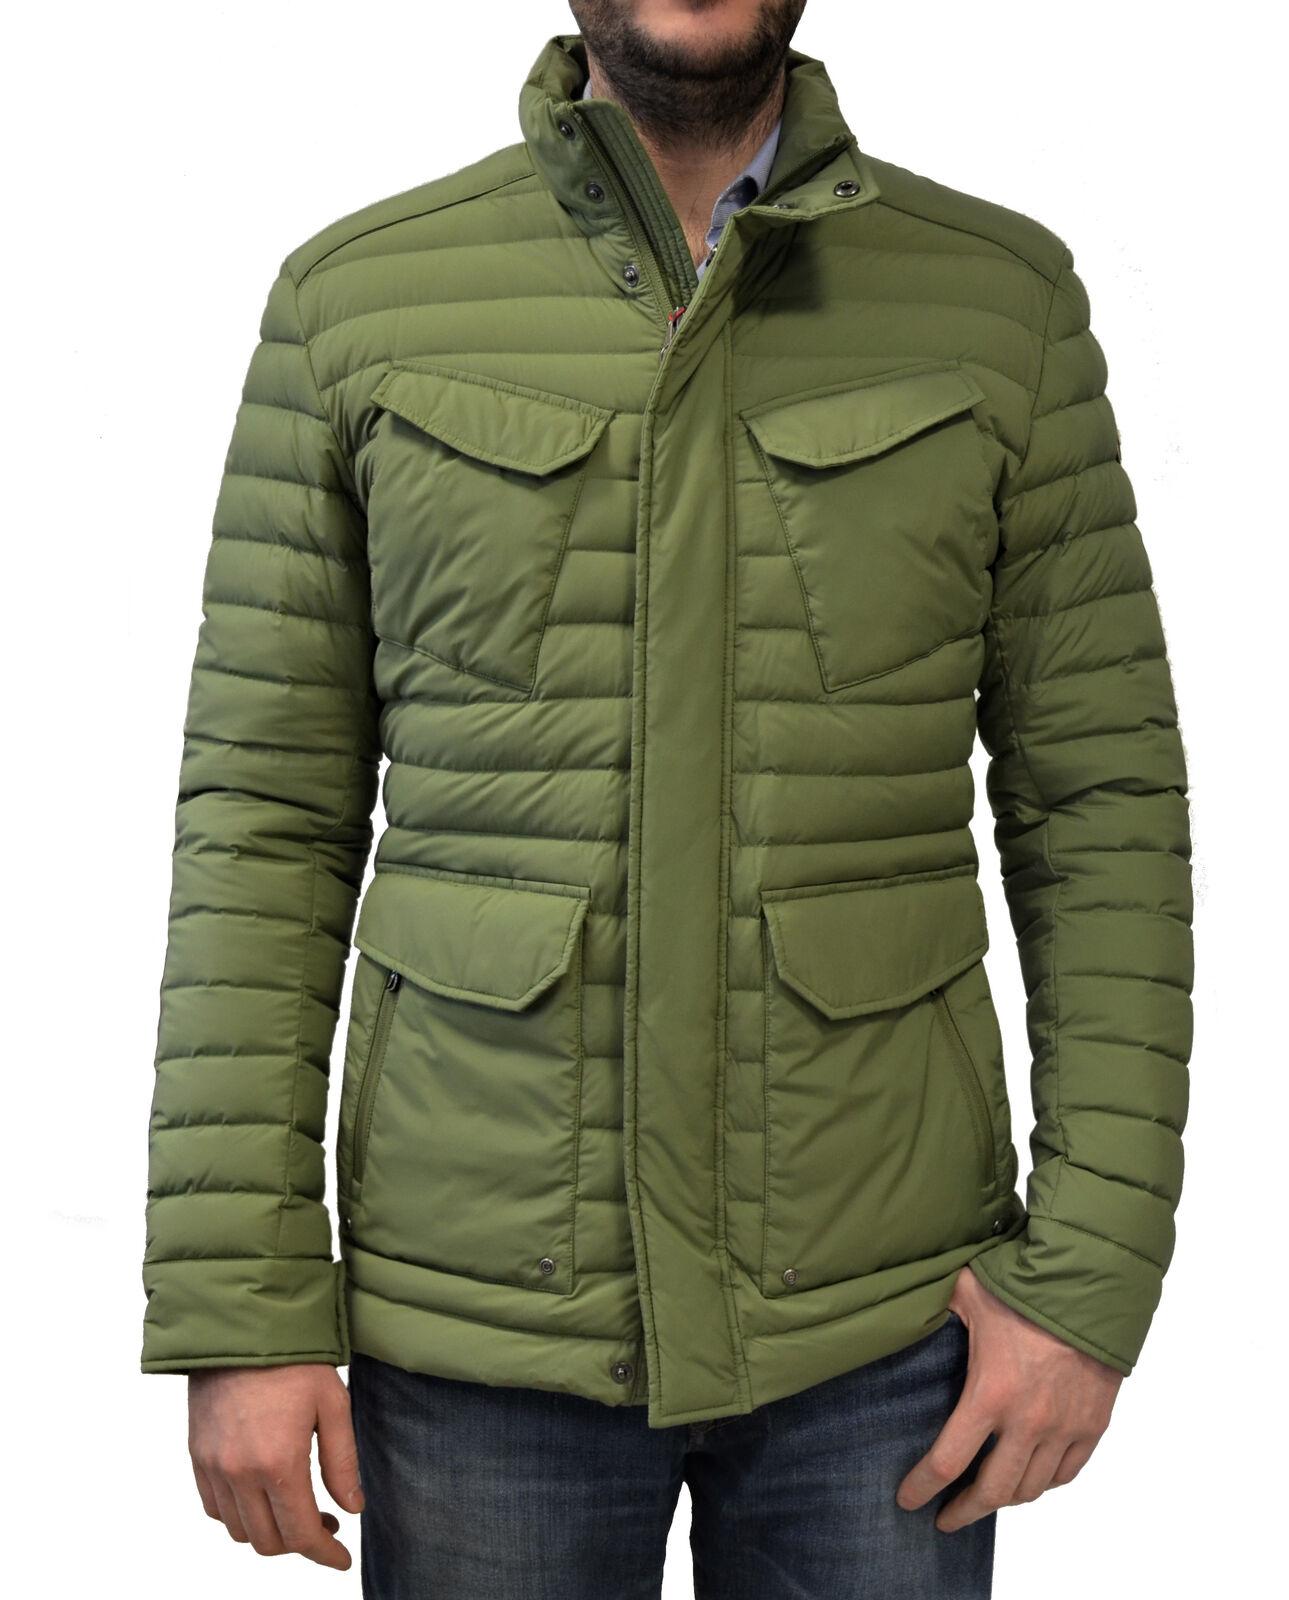 Giacca Giubbotto Piumino Colmar Uomo verde Jacket Jacket Jacket Uomo verde 1259 432eae